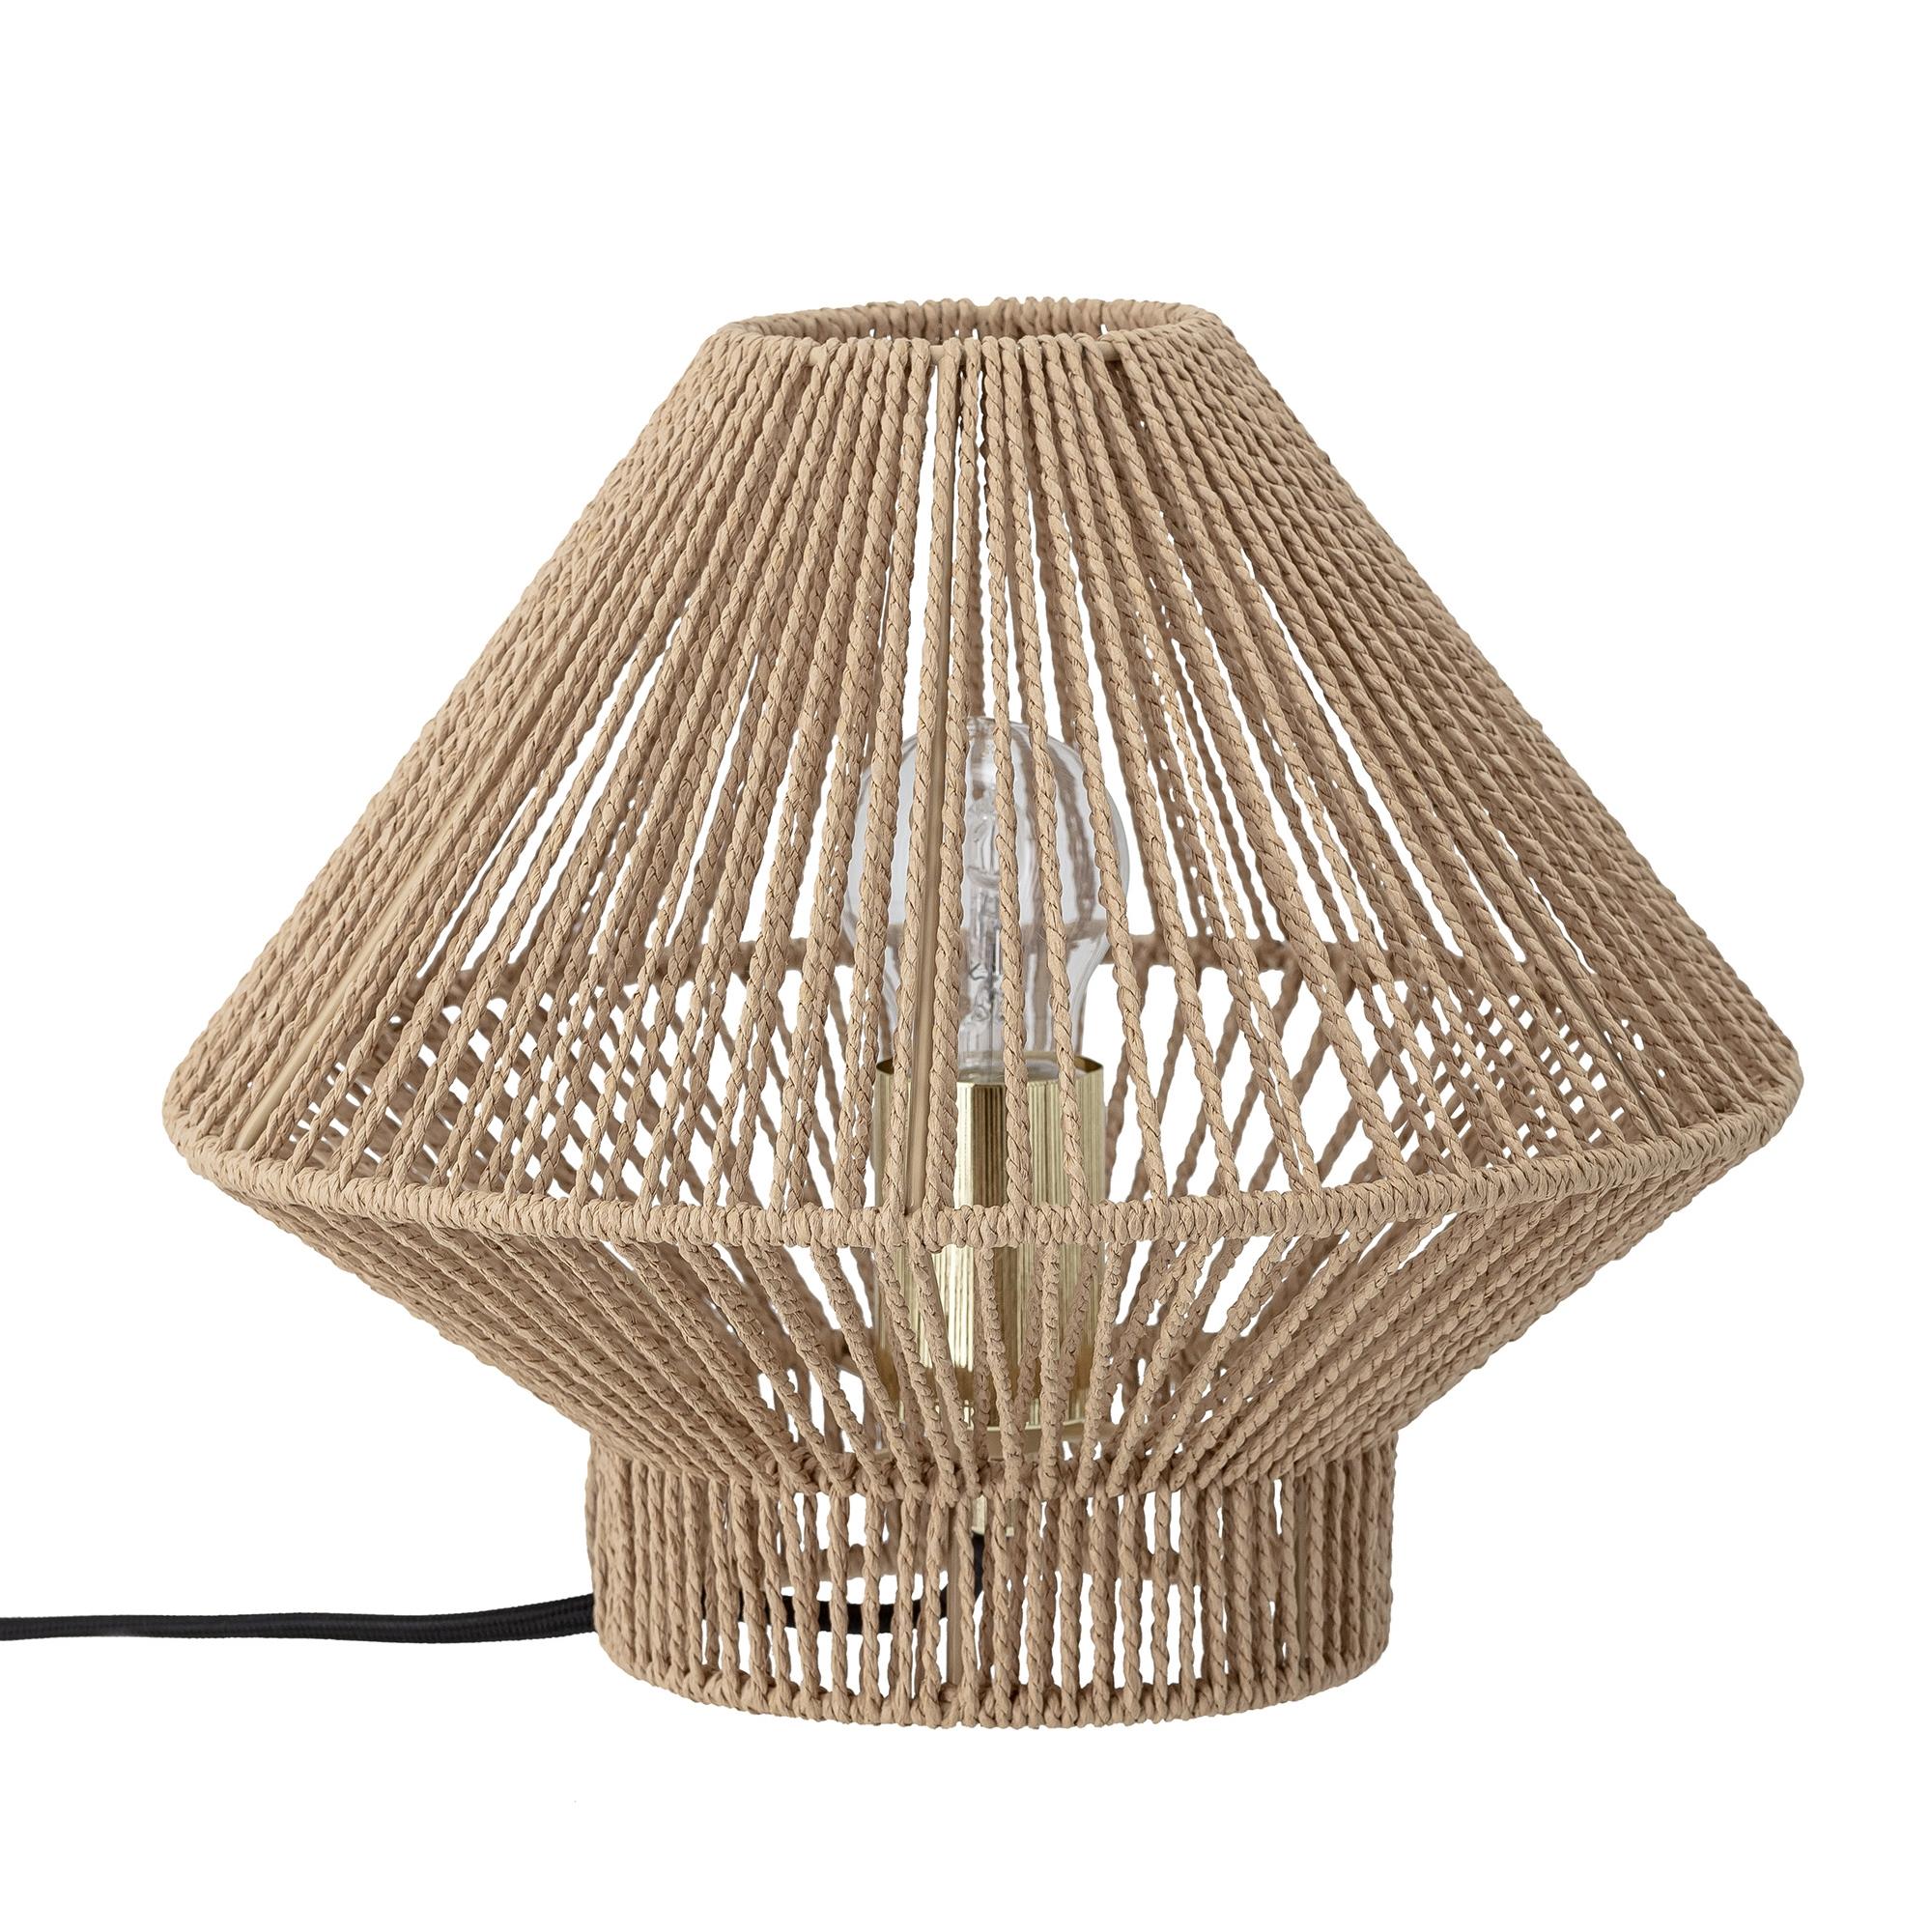 Bloomingville - Papir Table LampØ 30 cm - Natur (82048614)